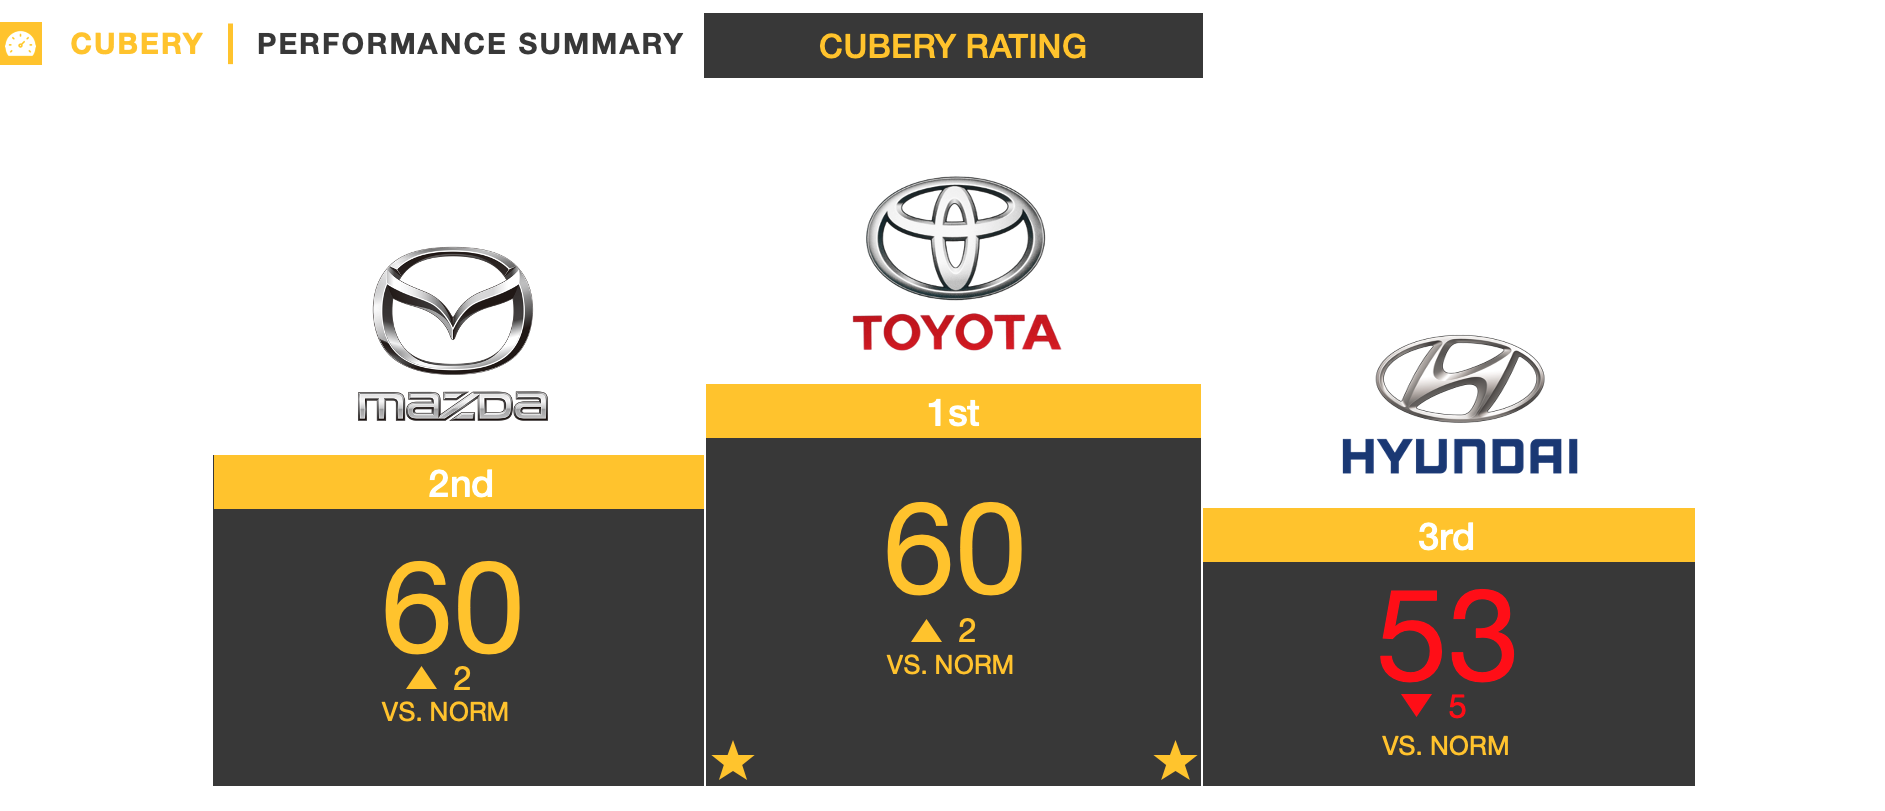 Ad Testing - SUV Automotive Advertising Australia - Toyota, Mazda and Hyundai results